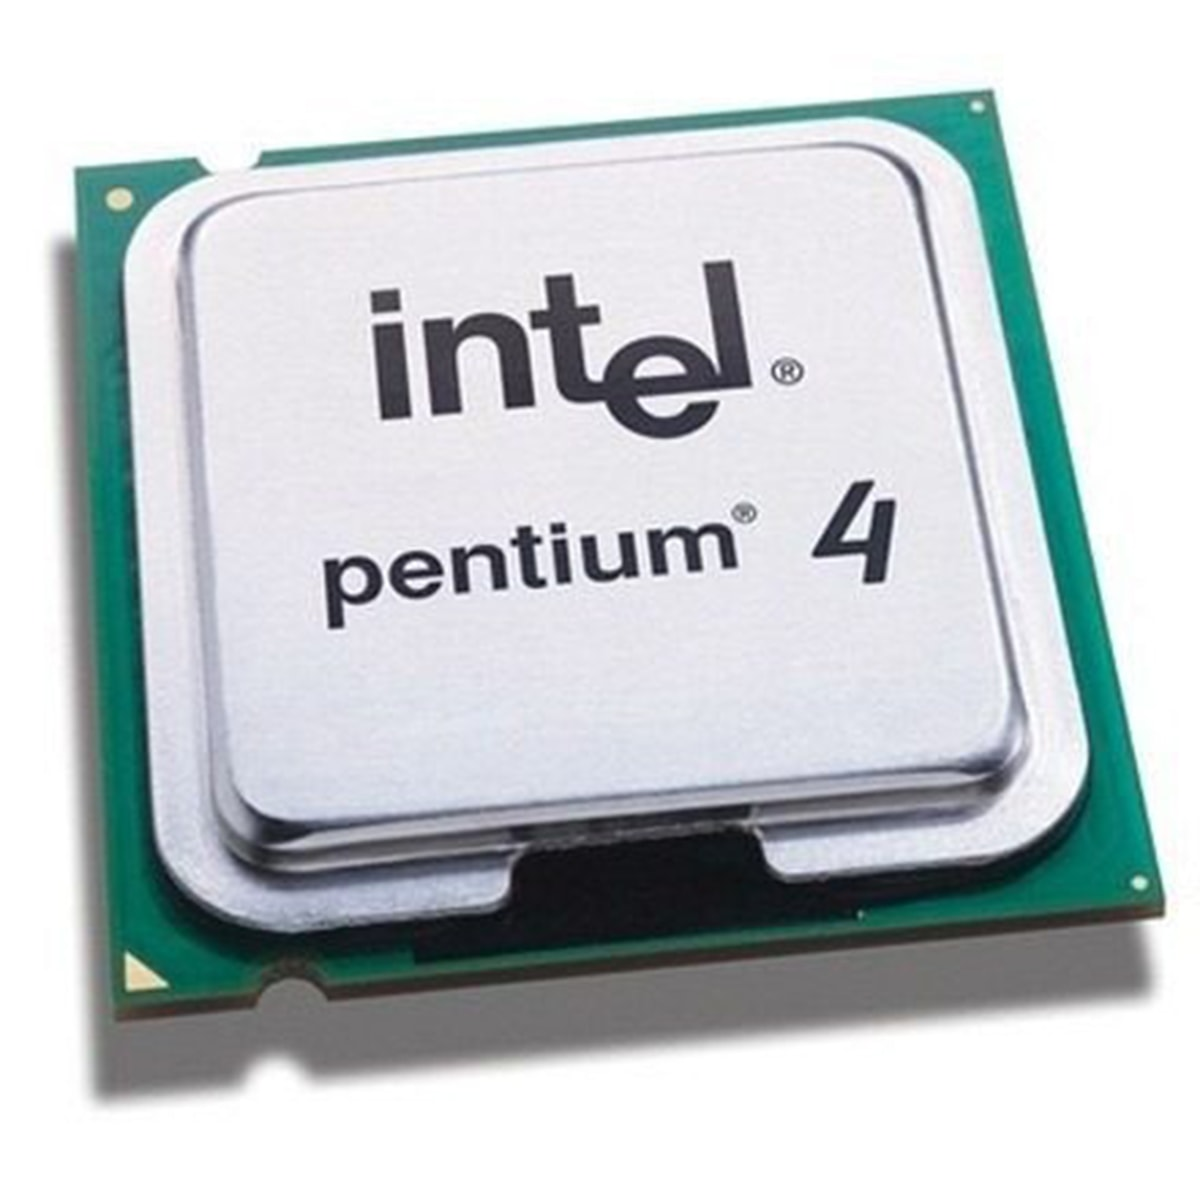 Processador Intel Pentium 4 HT 640 2M Cache / 3.20 GHz / 800 MHz / Socket 775 - Seminovo